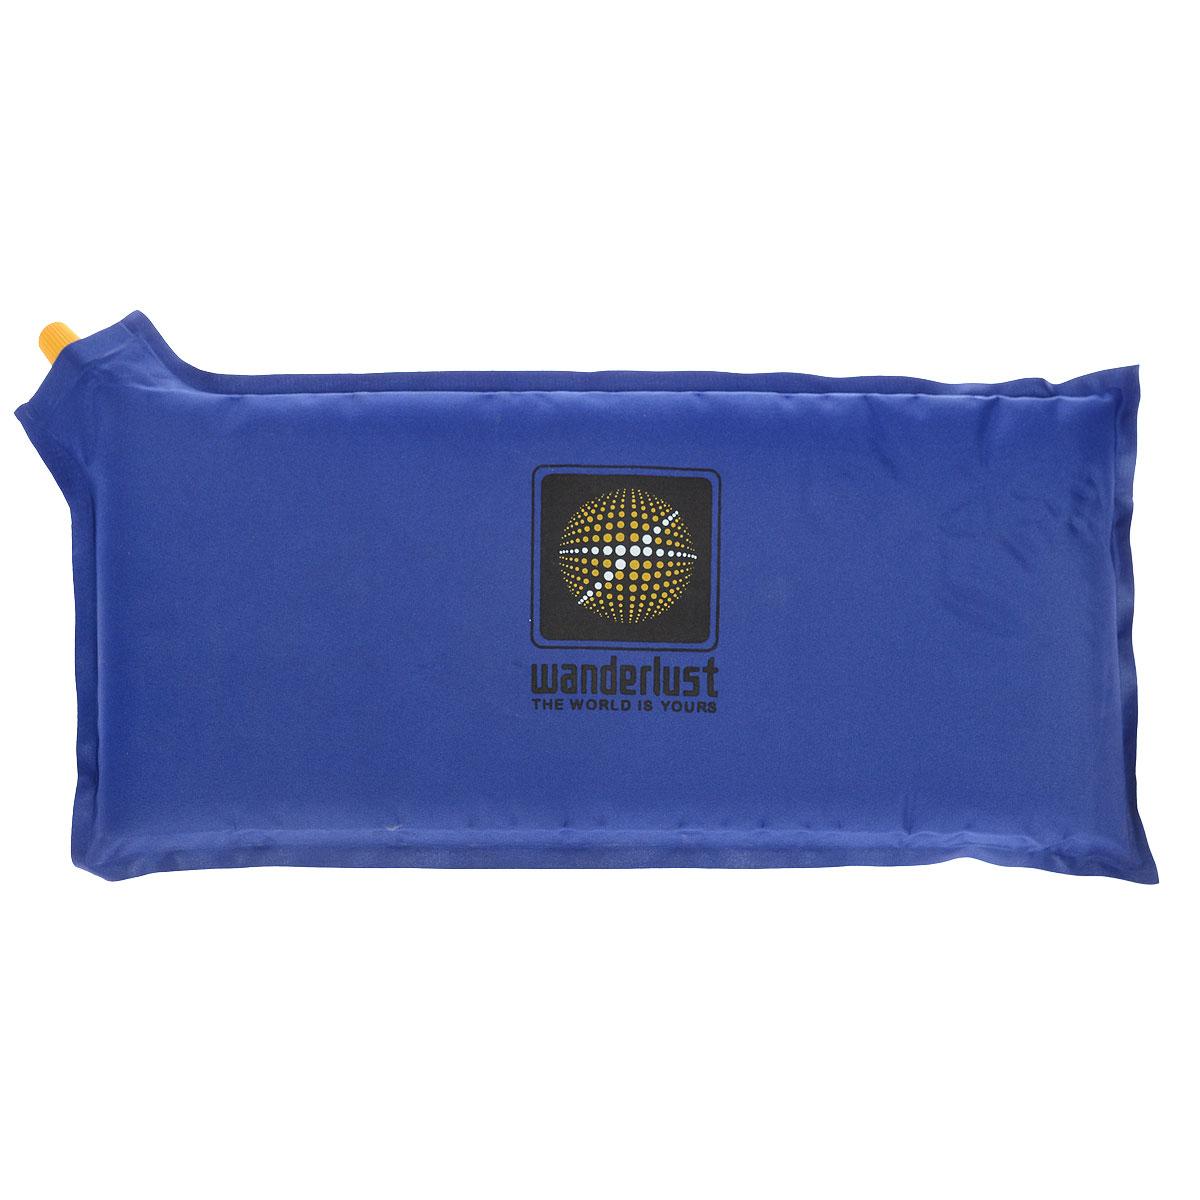 Коврик-сиденье Wanderlust Seat III, самонадувающийся, цвет: синий